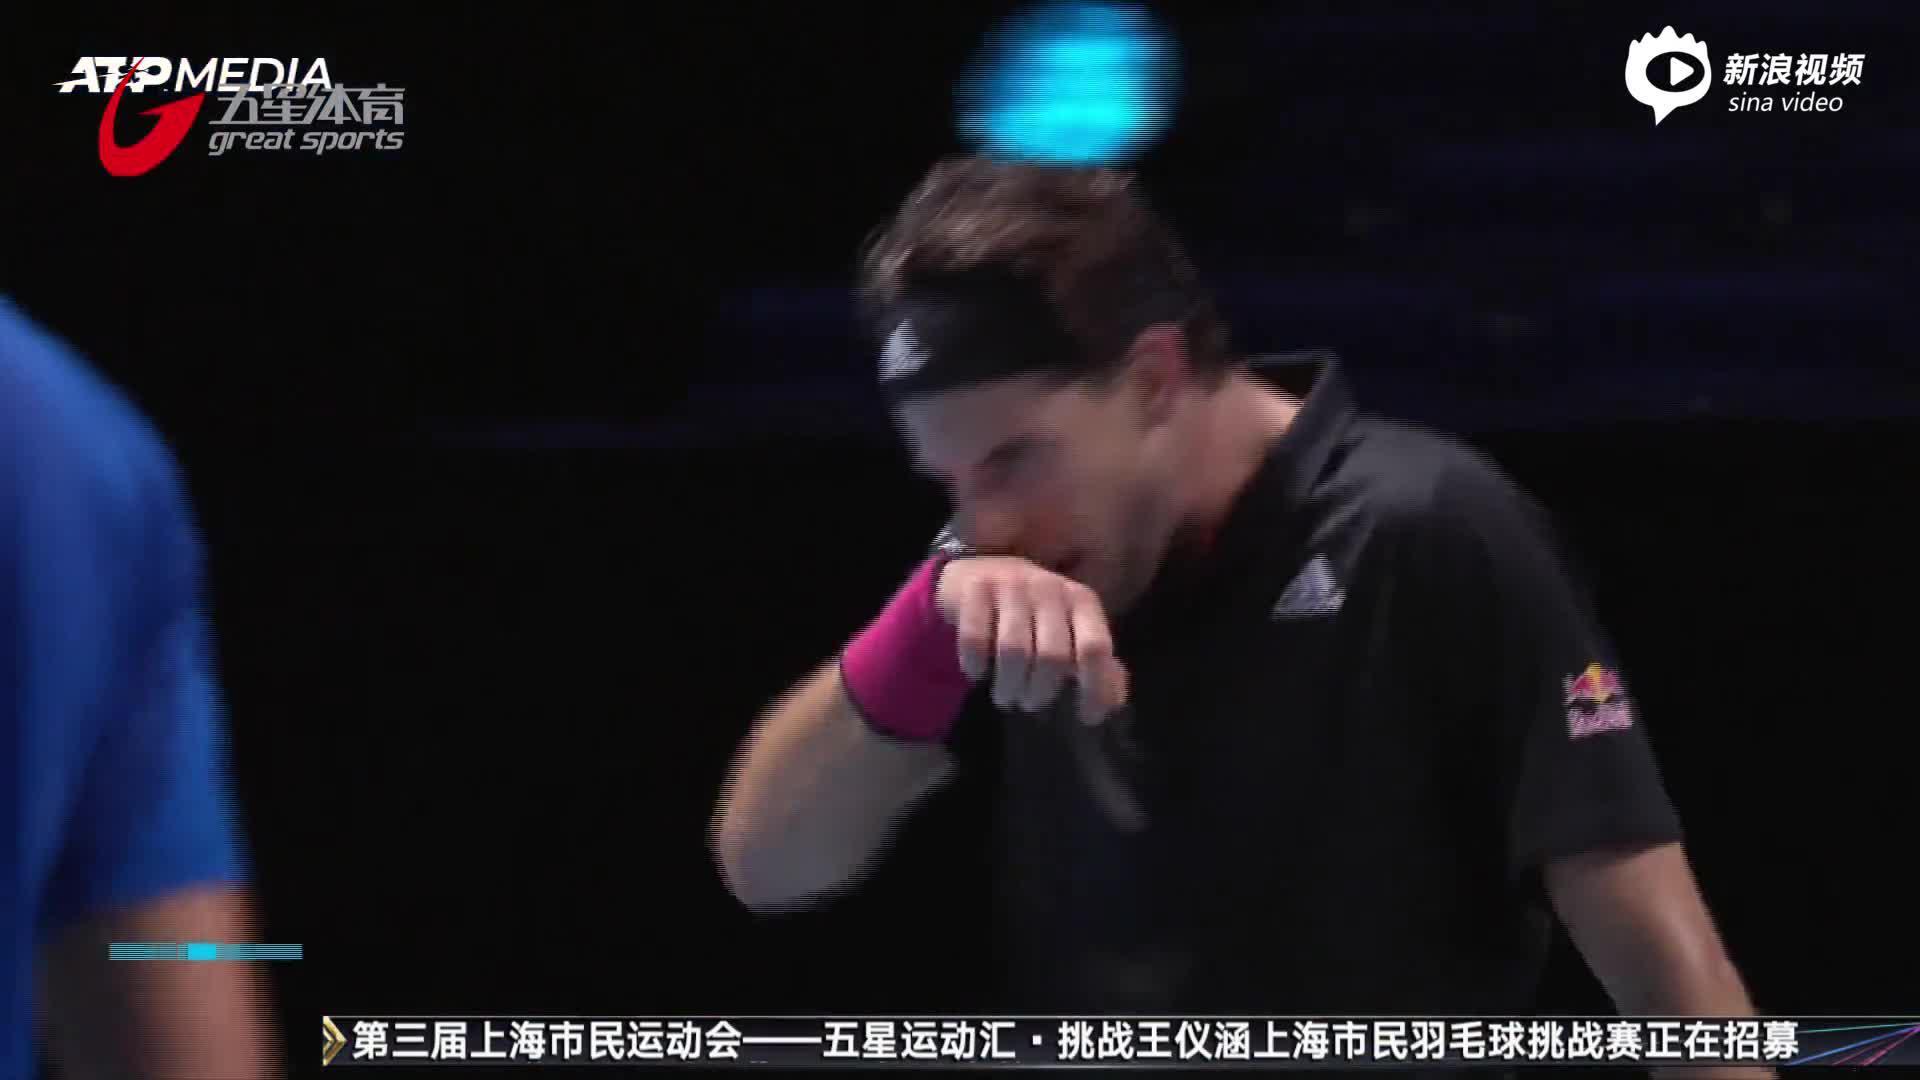 ATP年终总决赛:蒂姆力克德约 连续两年跻身争冠战